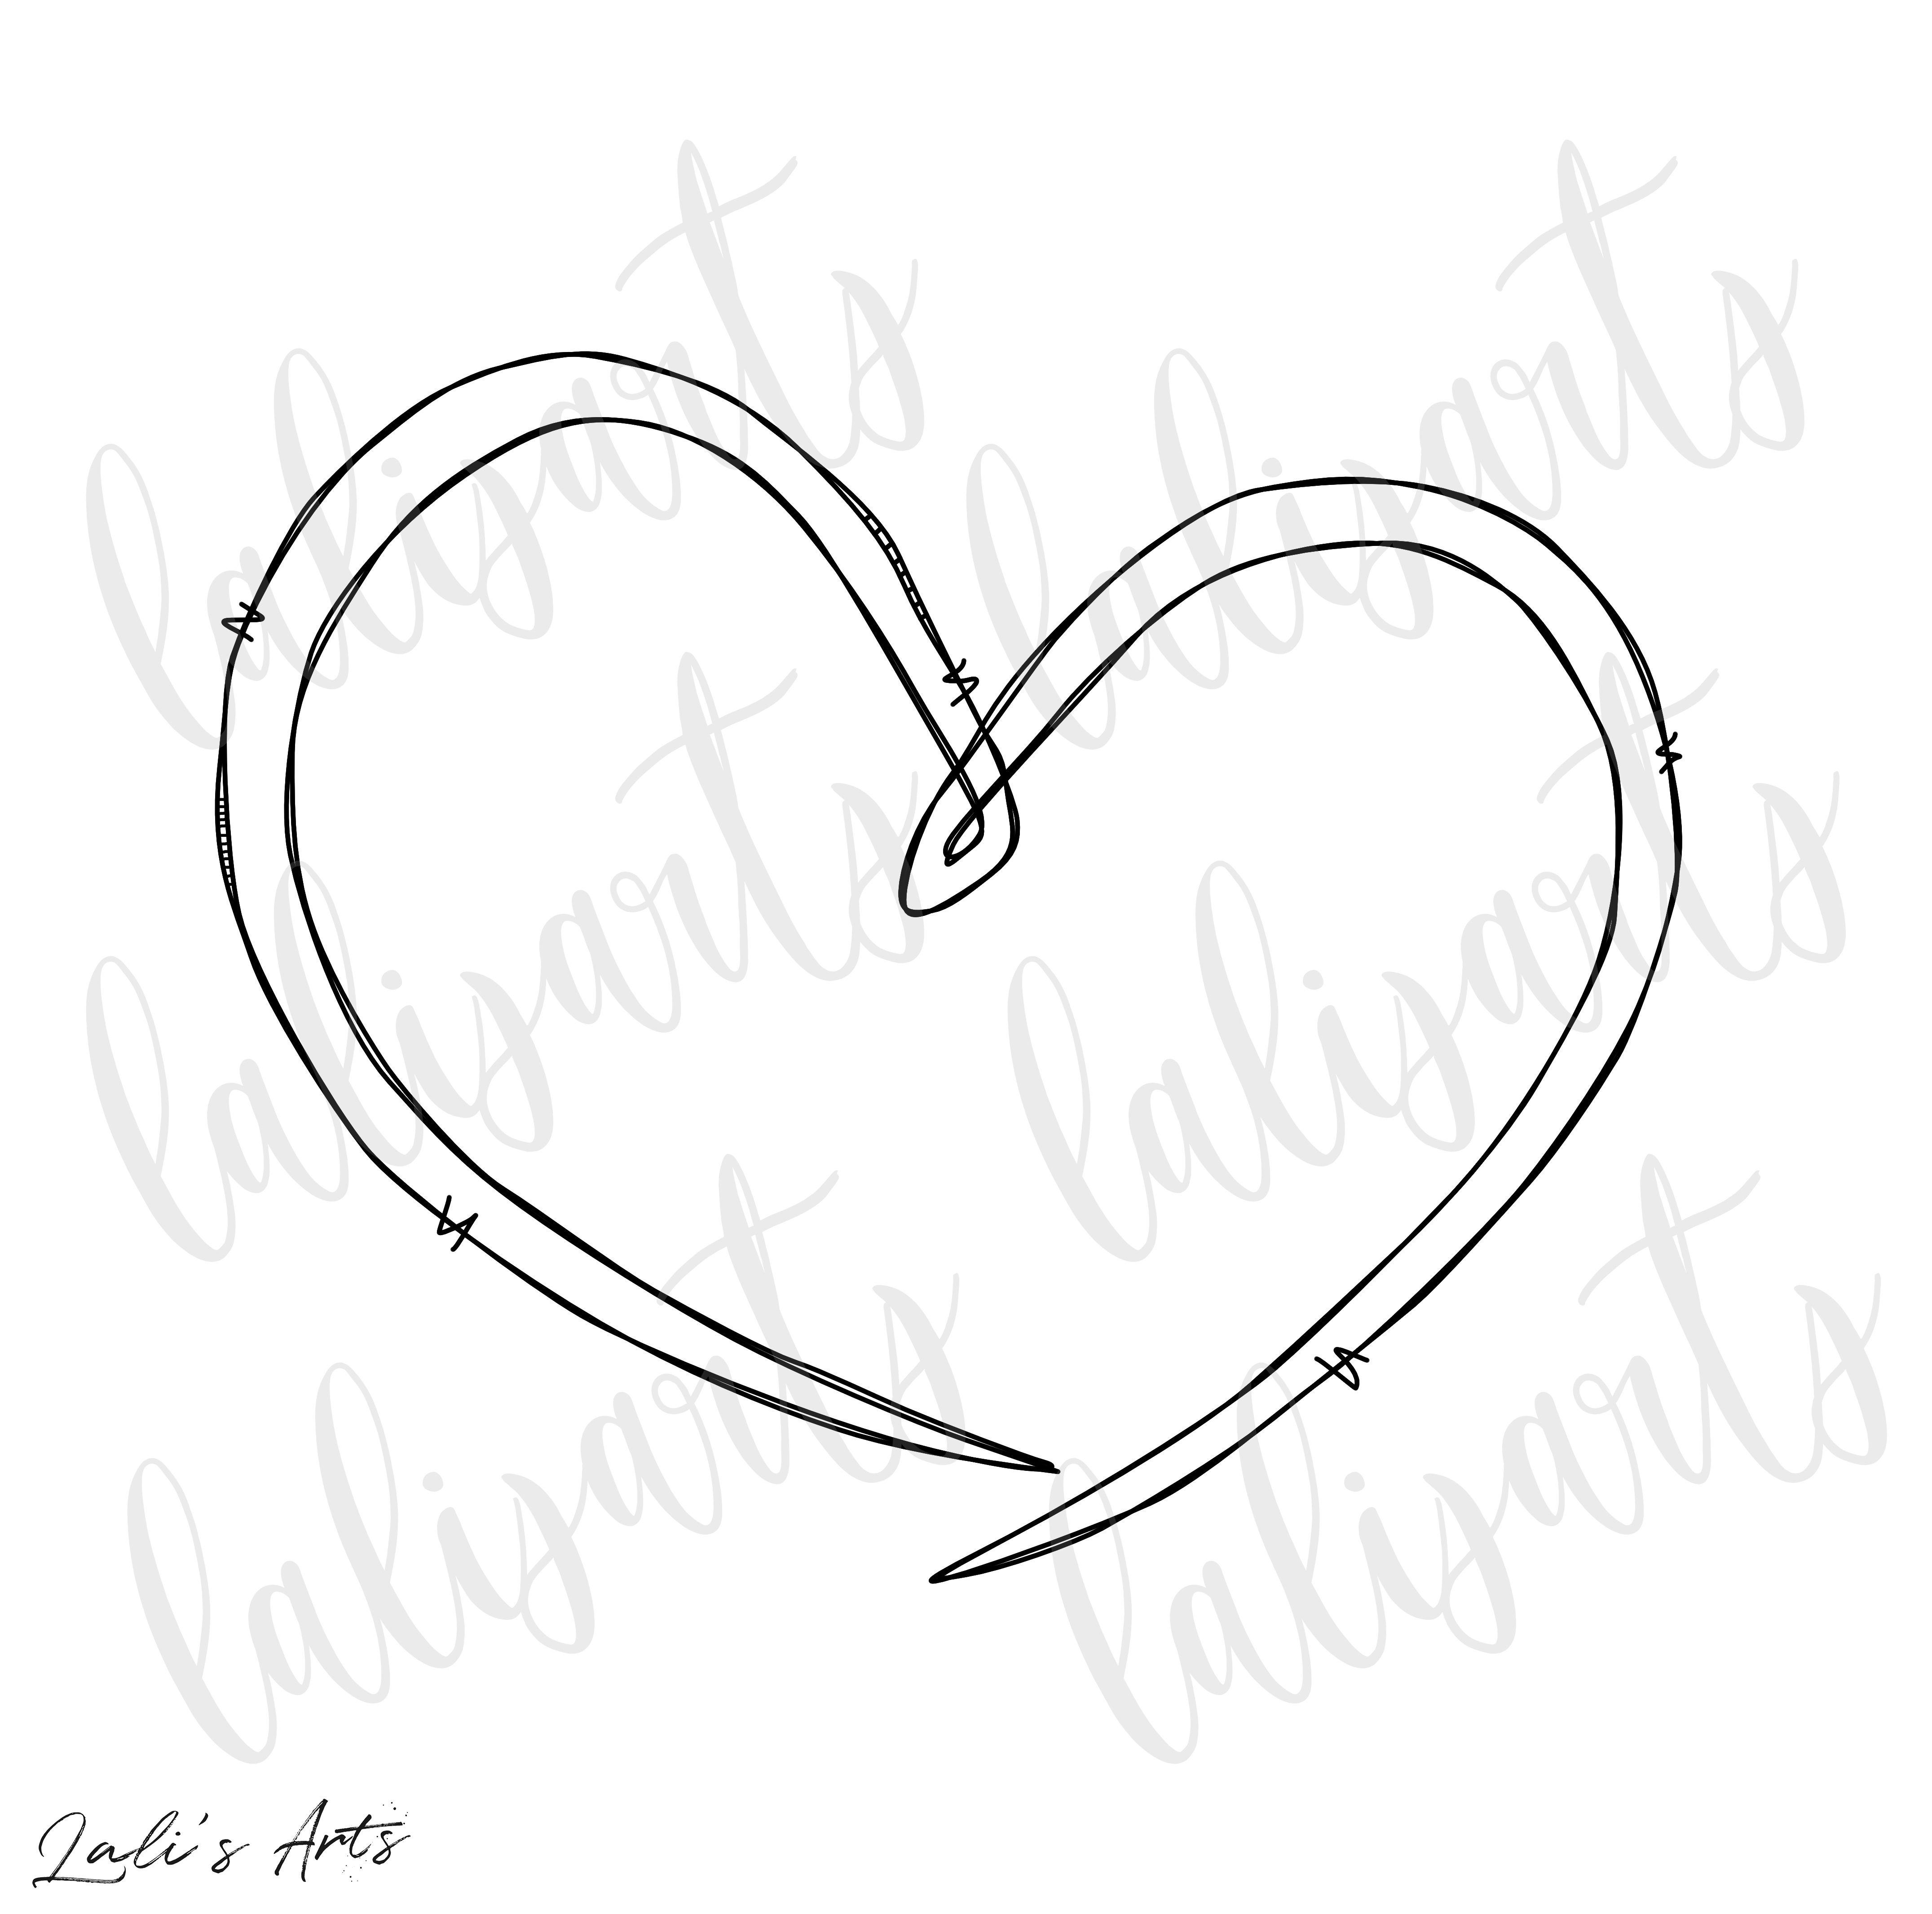 Heart Doodle Clipart Png Digital Design Download Etsy Heart Doodle Clip Art Heart Tattoo Designs